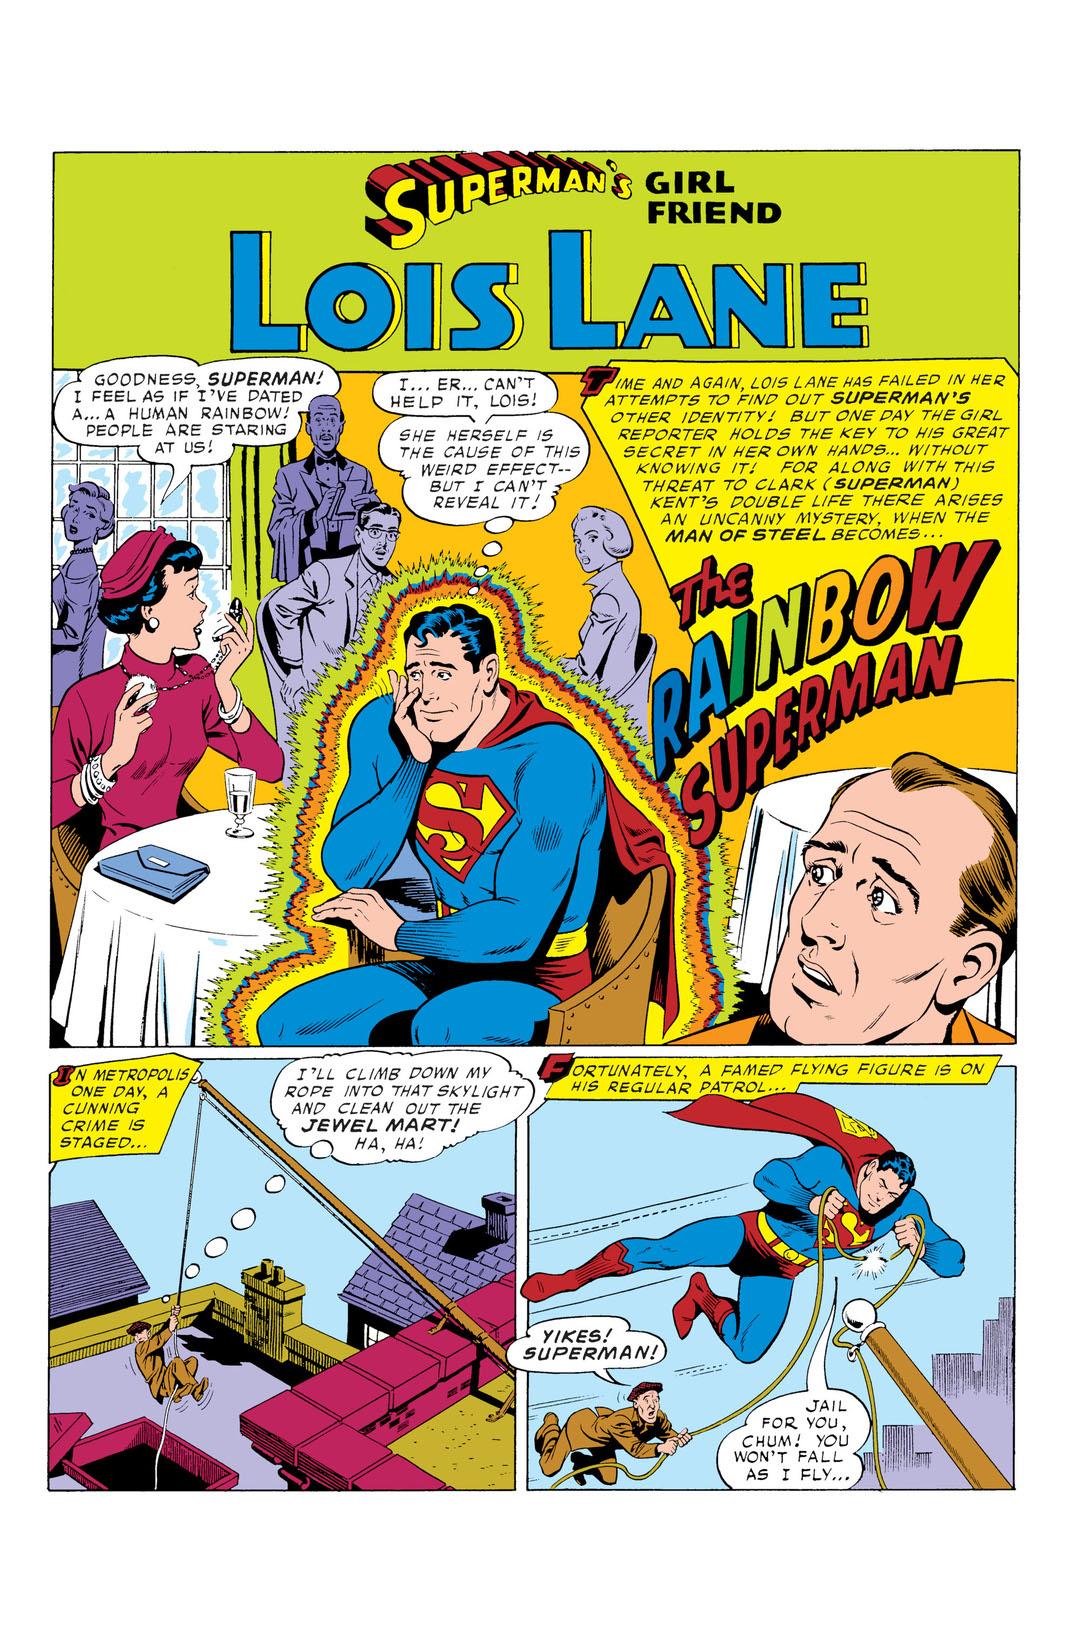 Read Superman's Girl Friend Lois Lane (1958-1973) #3 on DC Universe